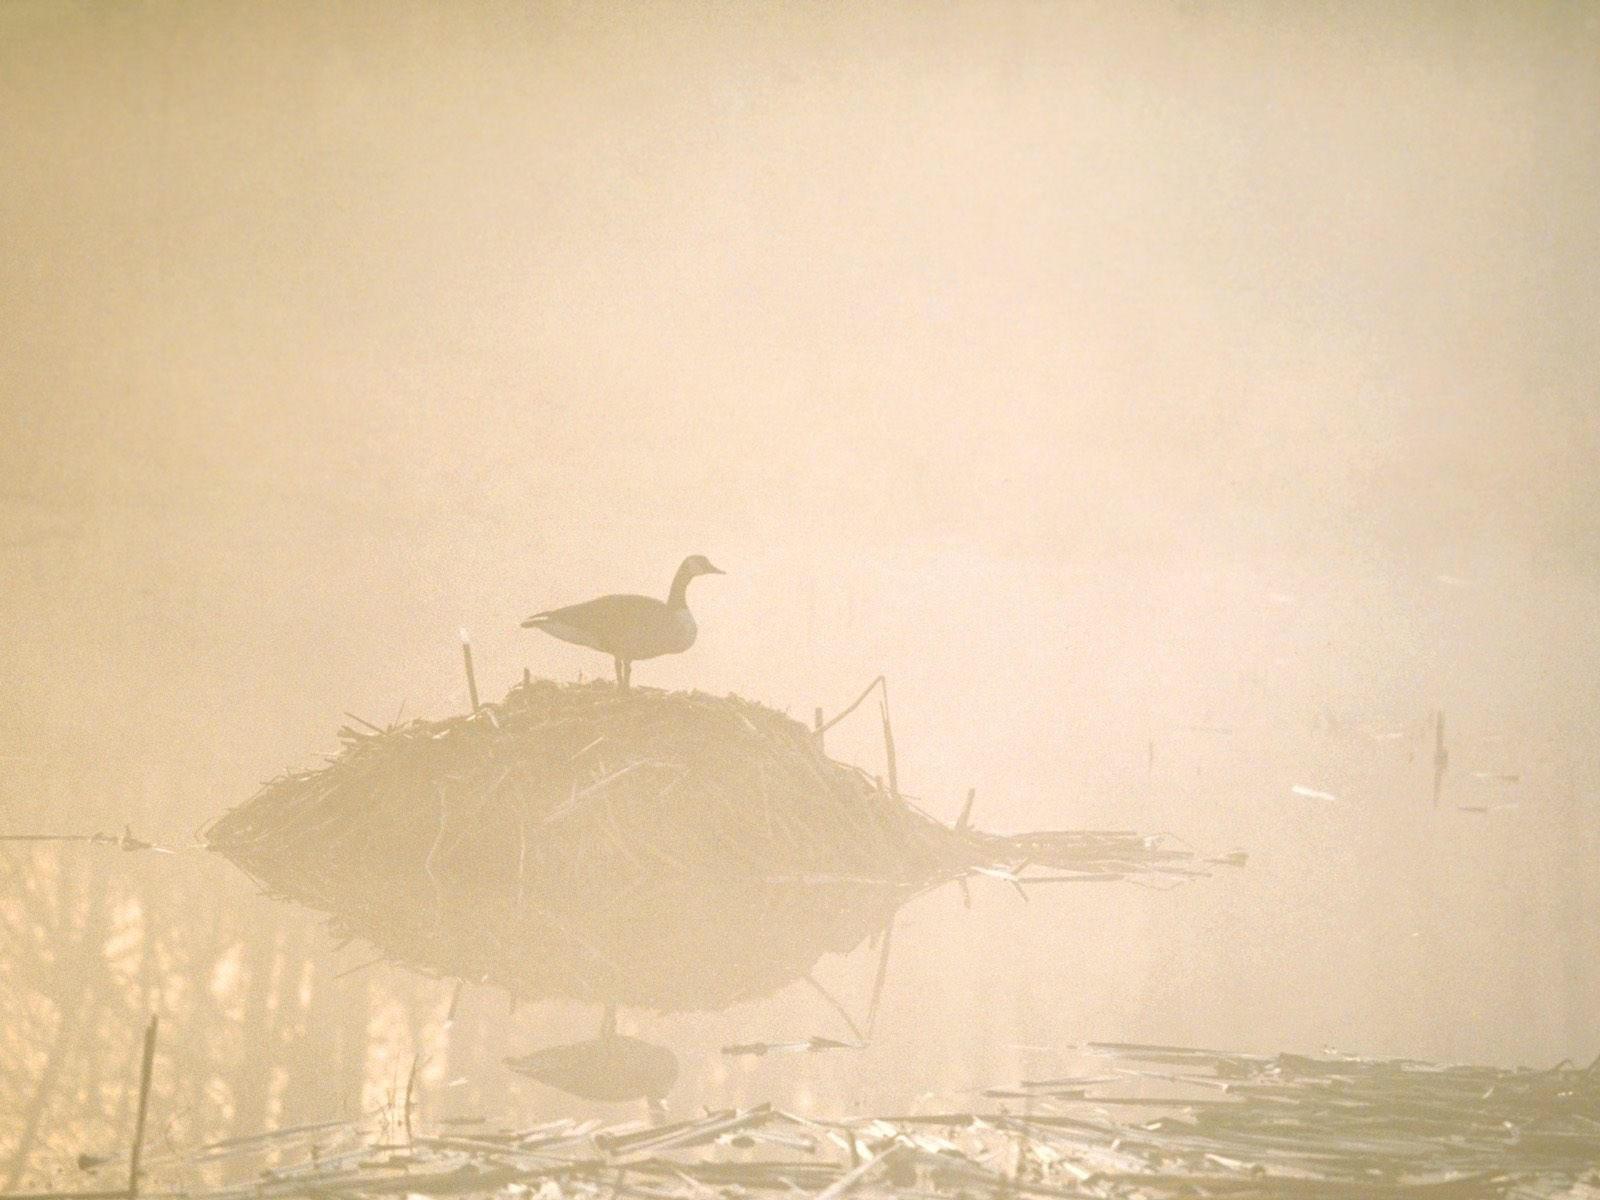 Утка на островке в воде